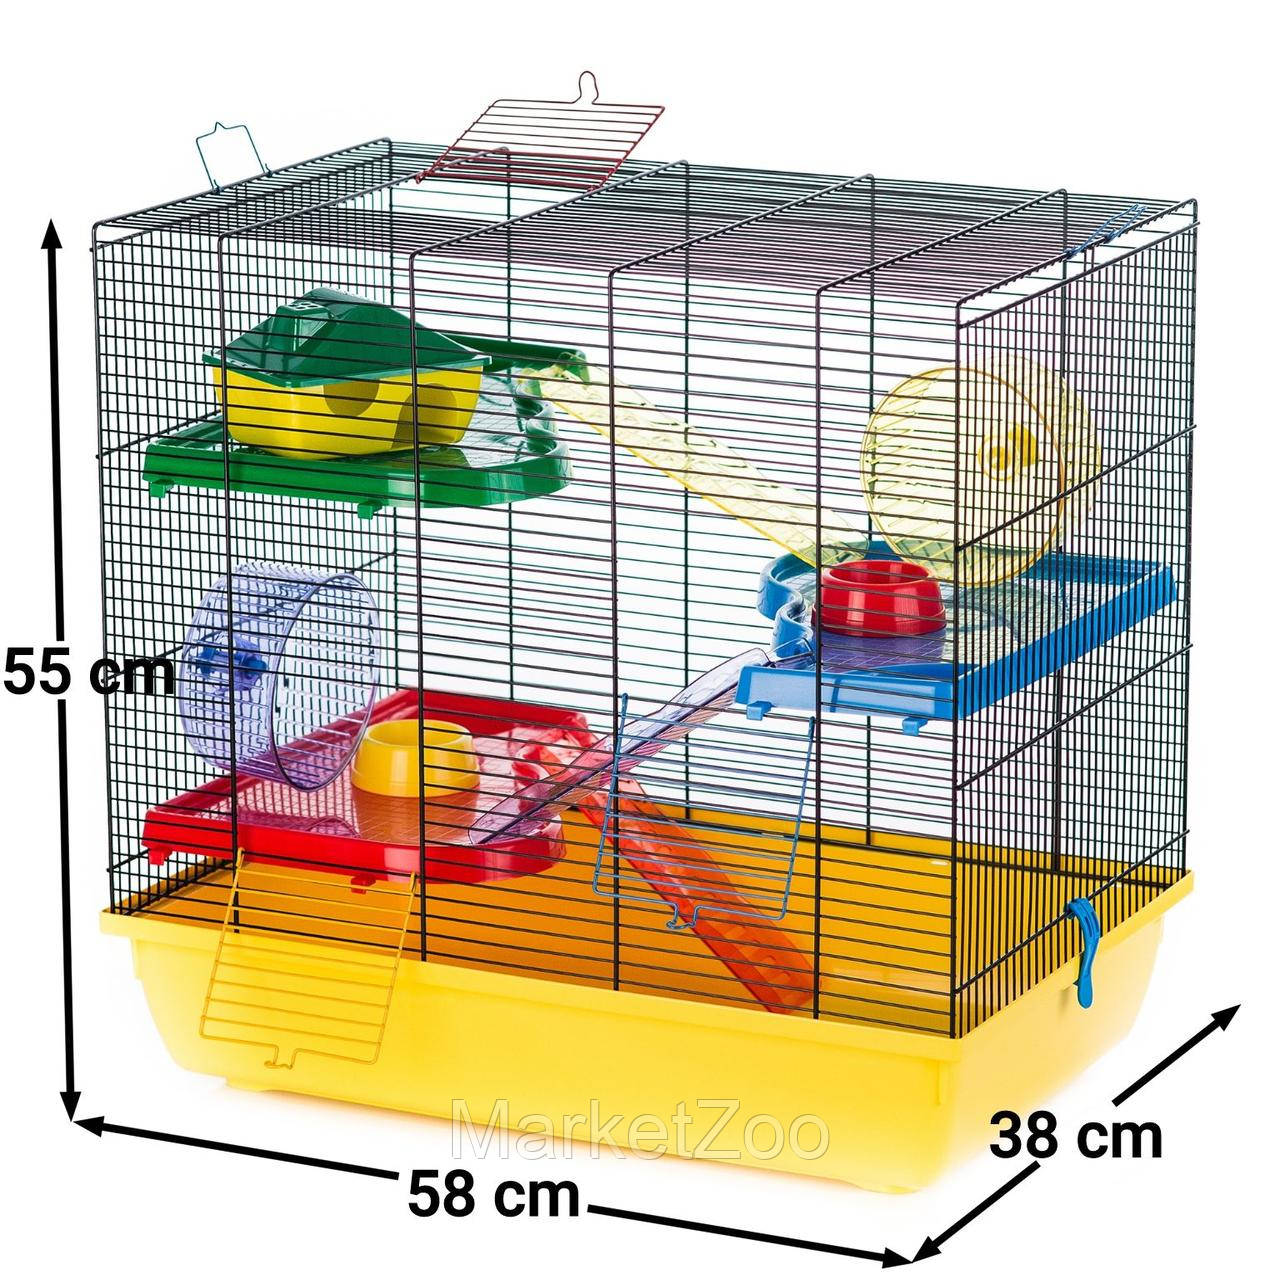 Клетка для грызунов TEDDY GIGANT II ™️ InterZoo G085 (580*380*550 мм)